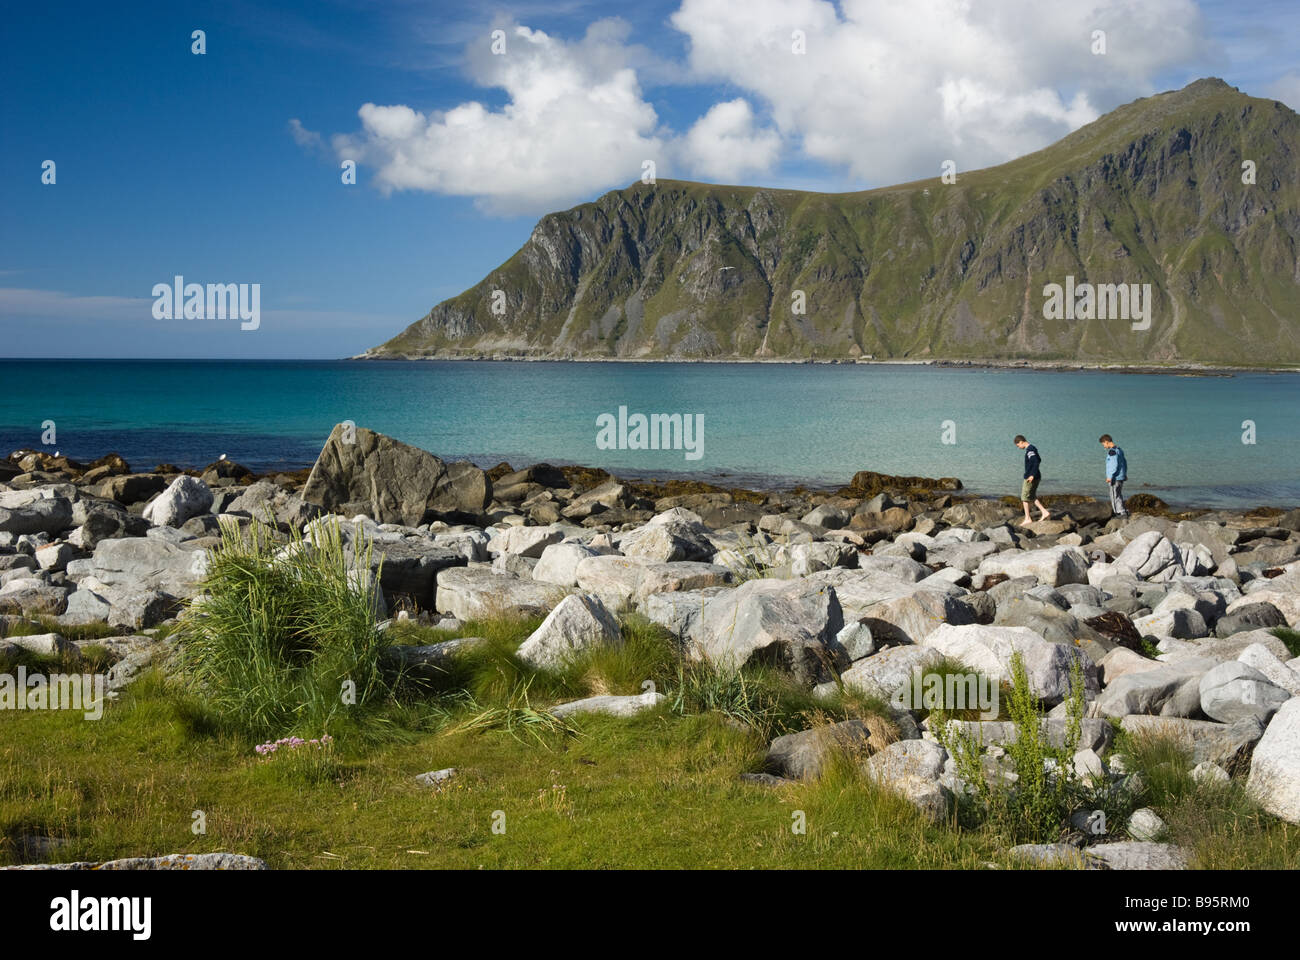 Stony beach near Ramberg, Flakstad, Flakstadøya island, Lofoten islands, Nordland, Norway, Scandinavia, Europe - Stock Image